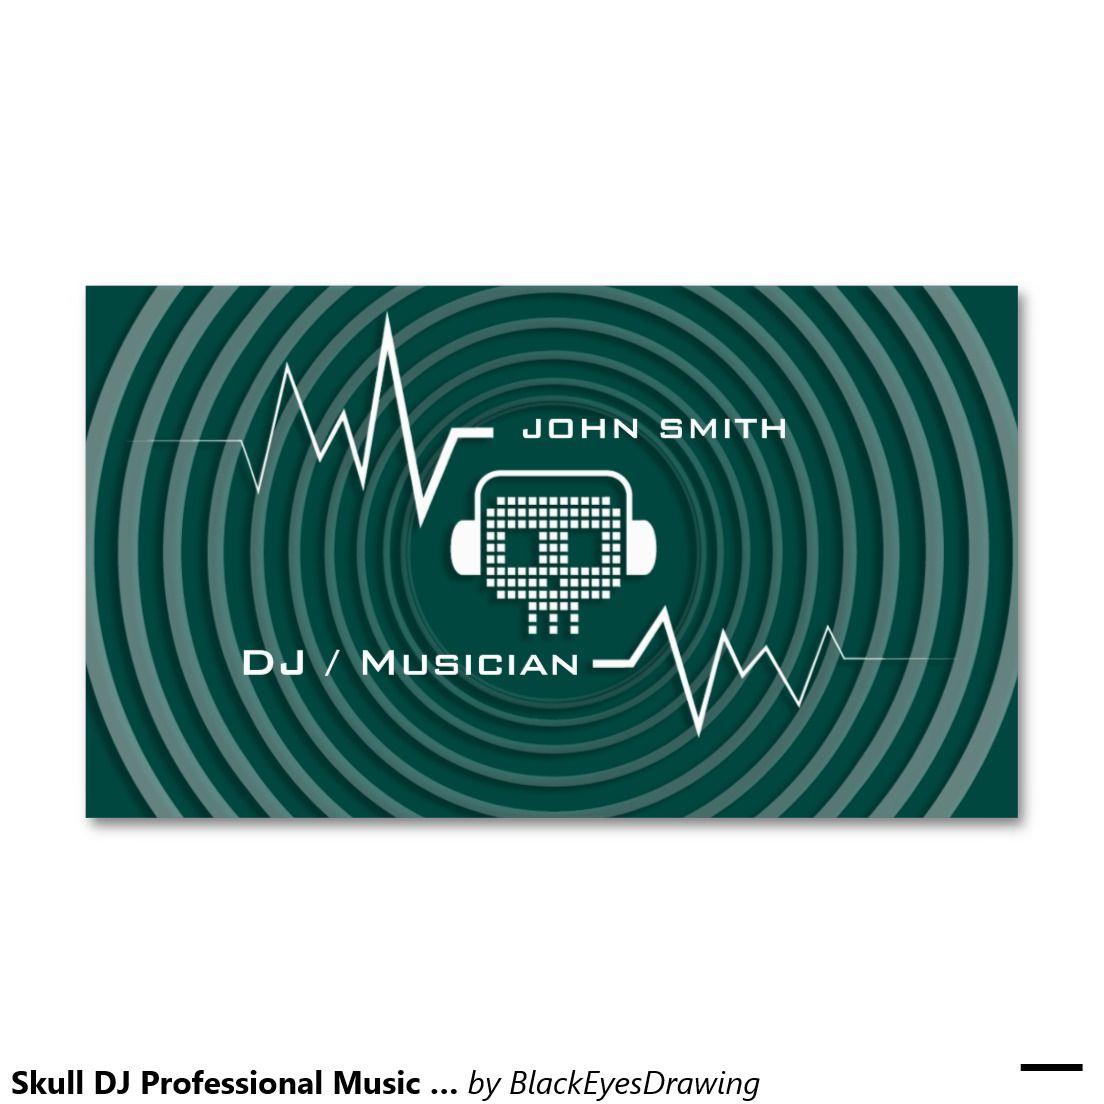 Skull DJ Professional Music Business Cards | DJ Business cards ...